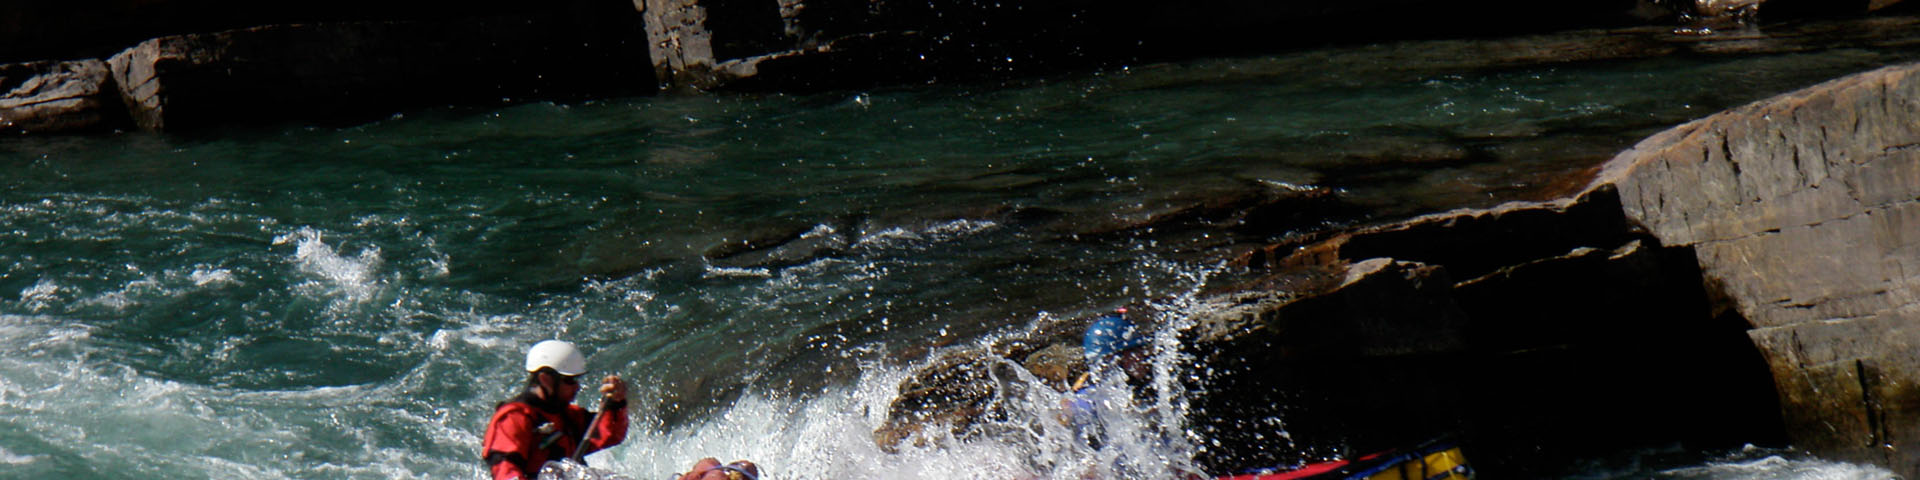 Natla-Keele River Canoe Trip by Black Feather - Image 272